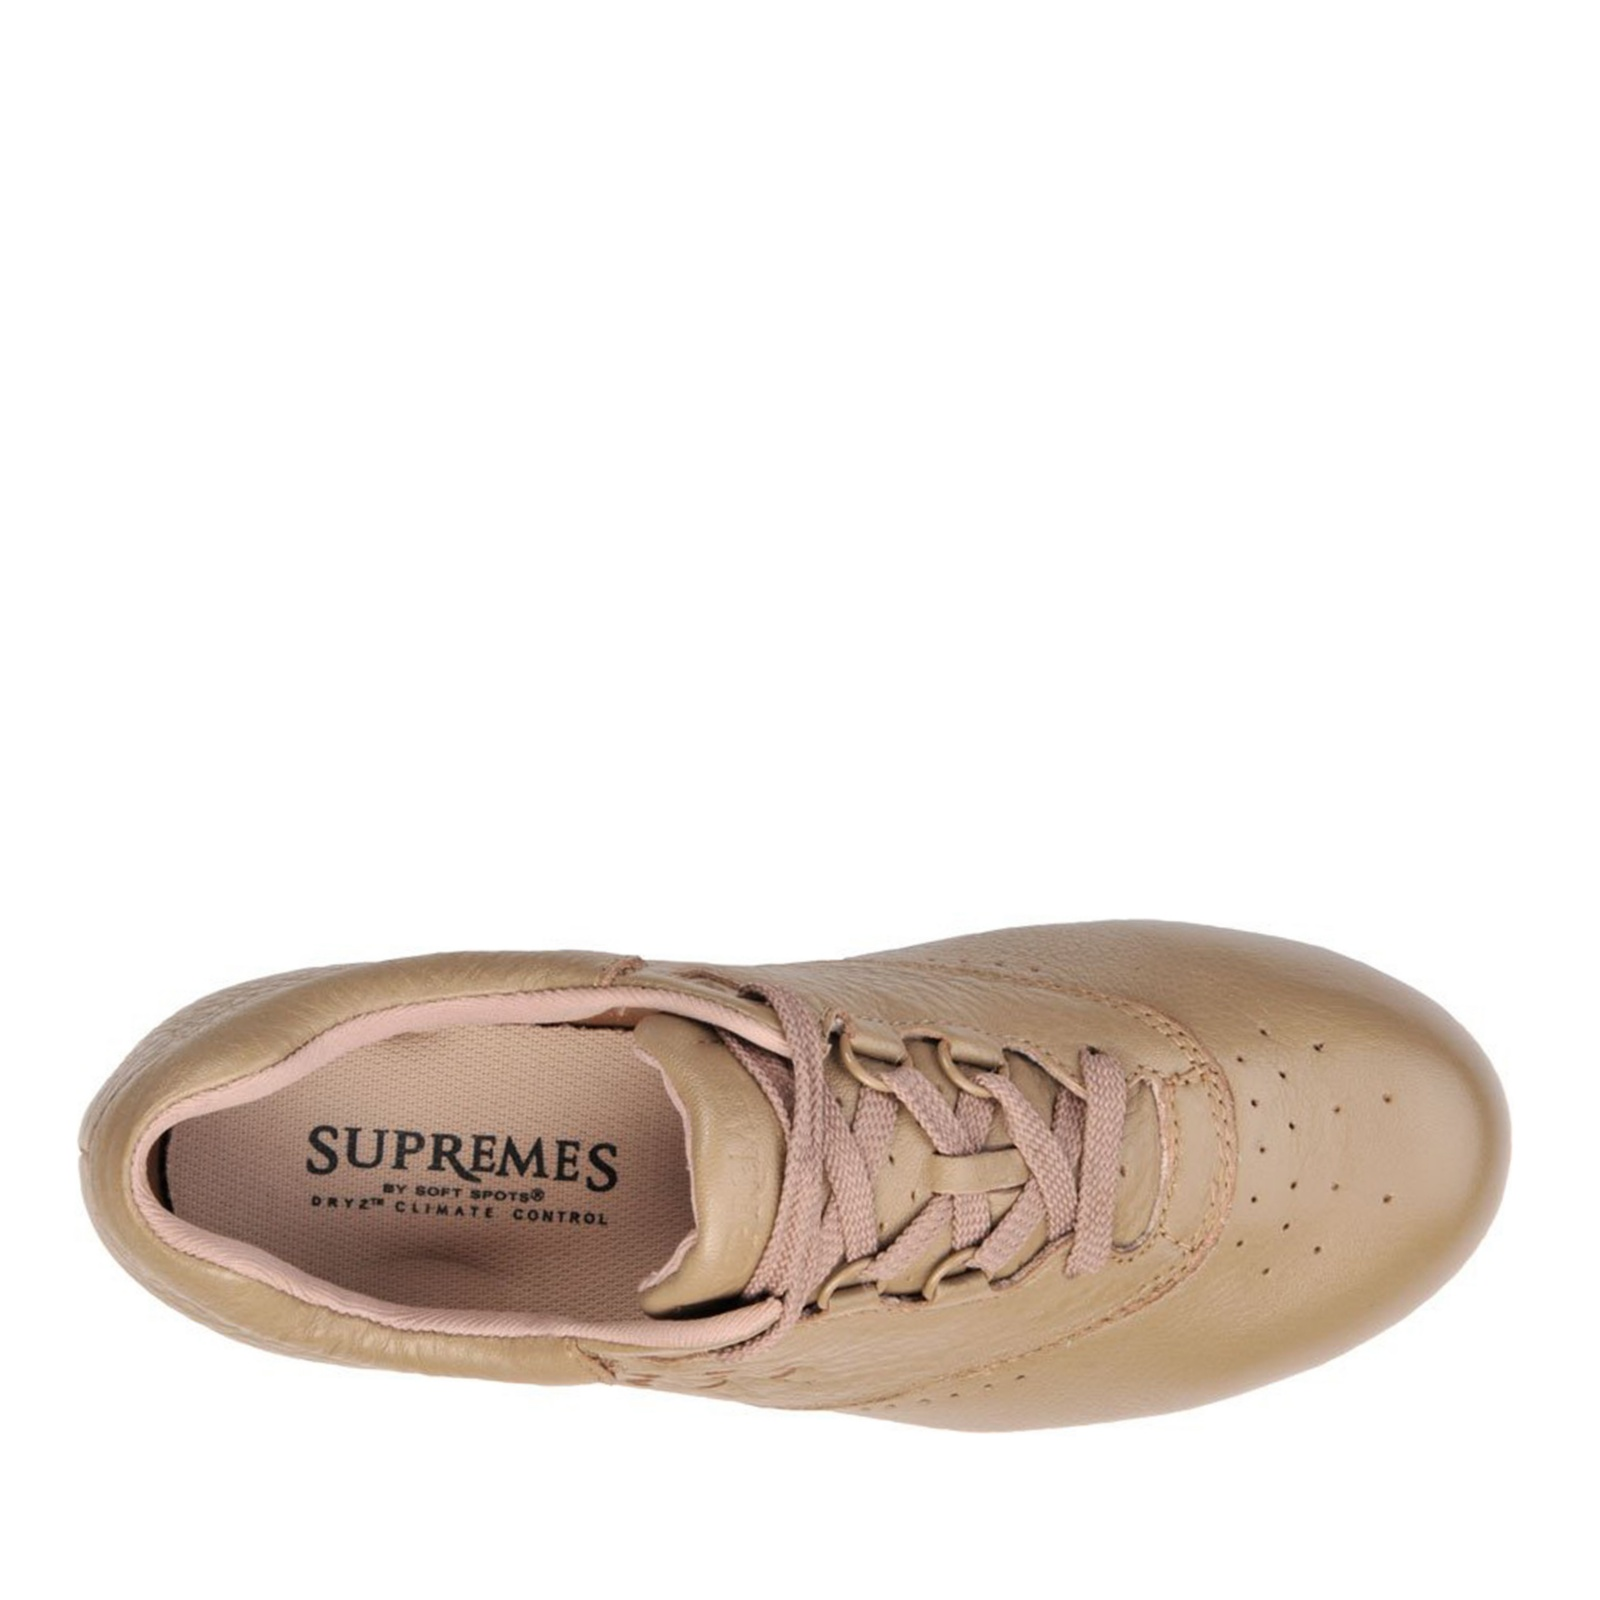 Softspots Women S Supremes Marathon Walking Shoes